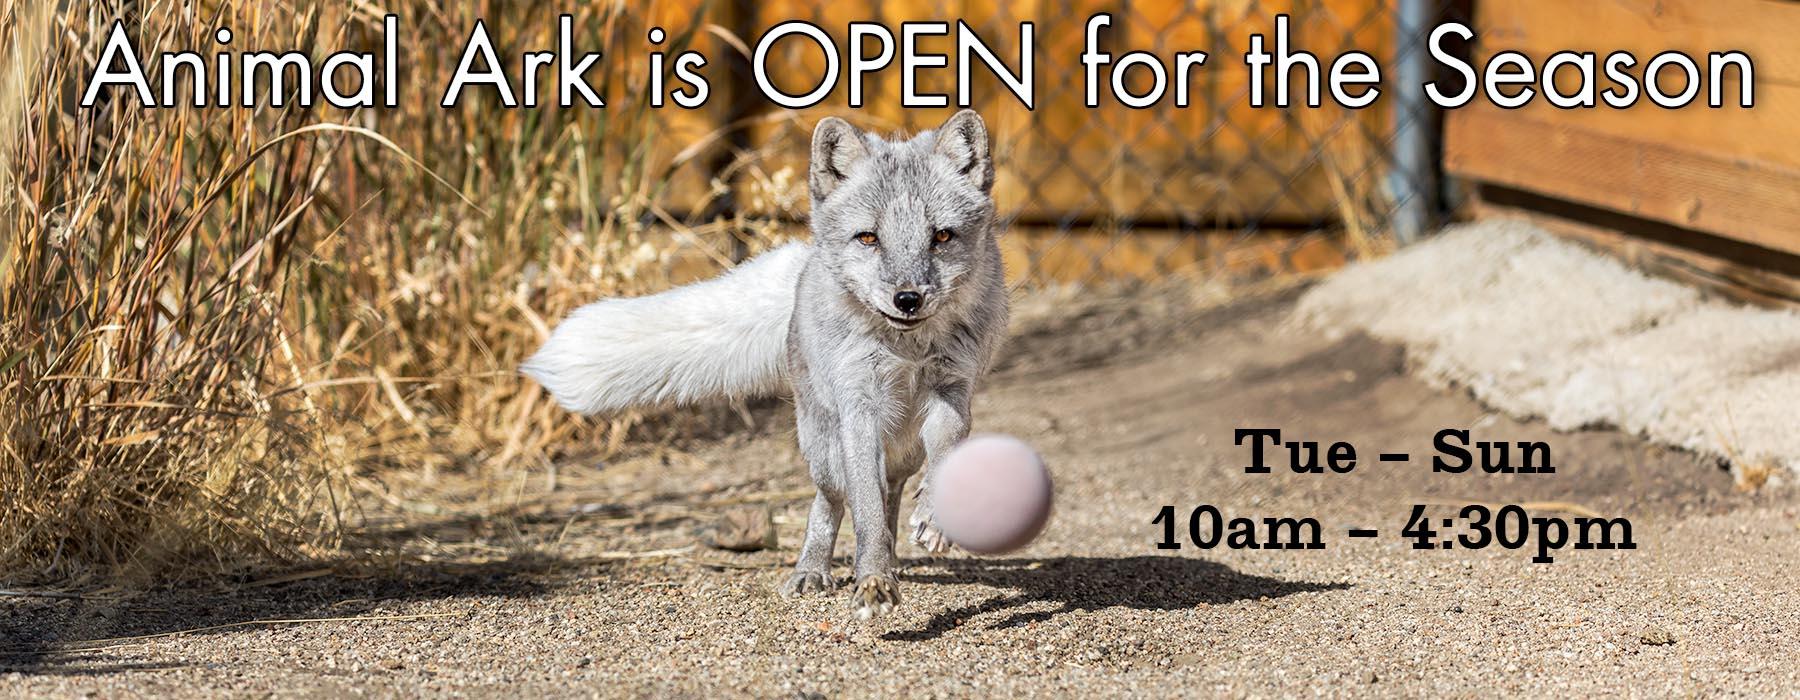 Open for Season